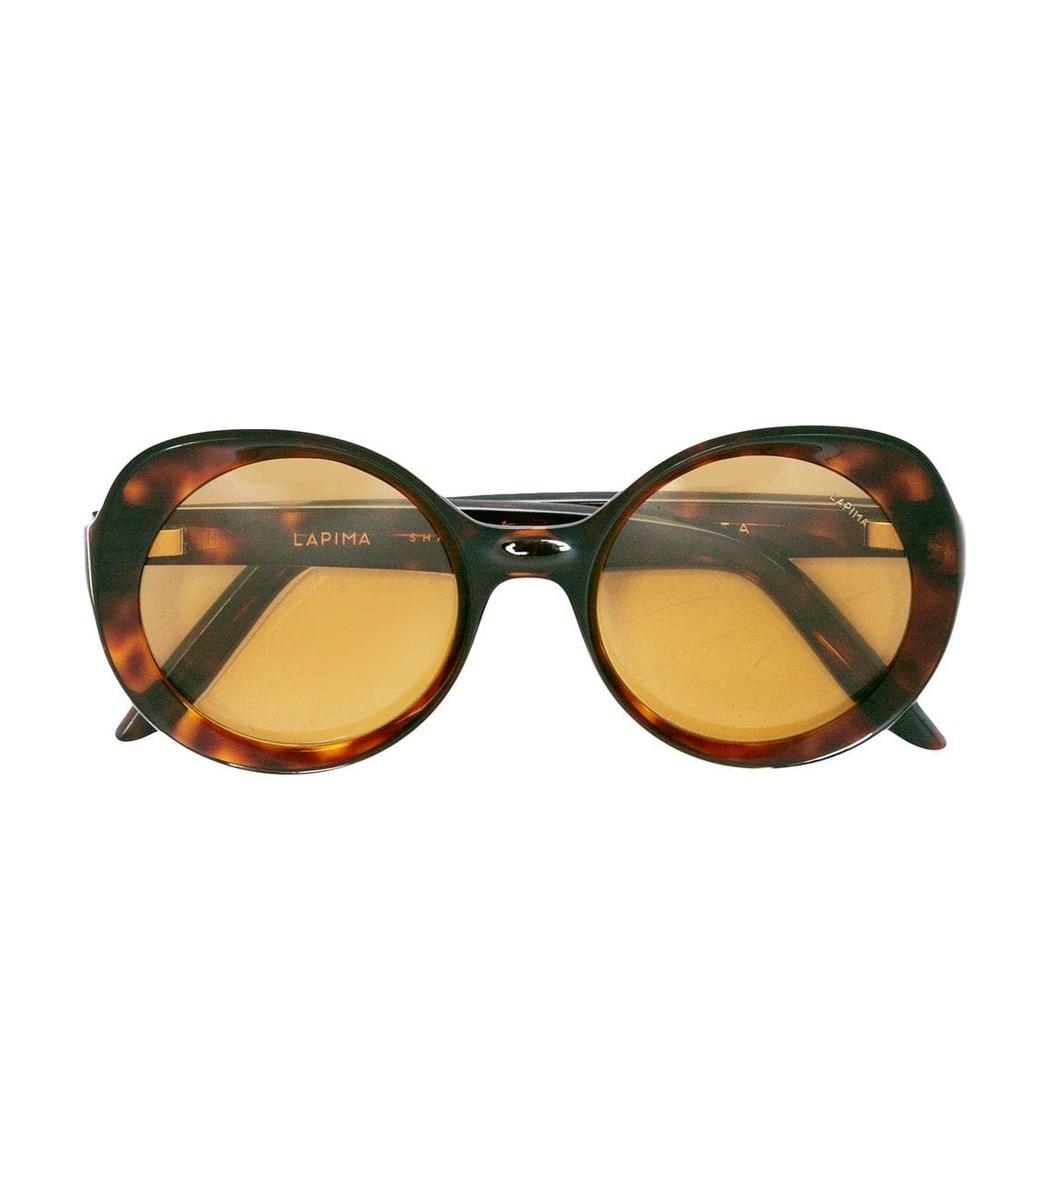 LAPIMA Tortoise Carlota Sunglasses